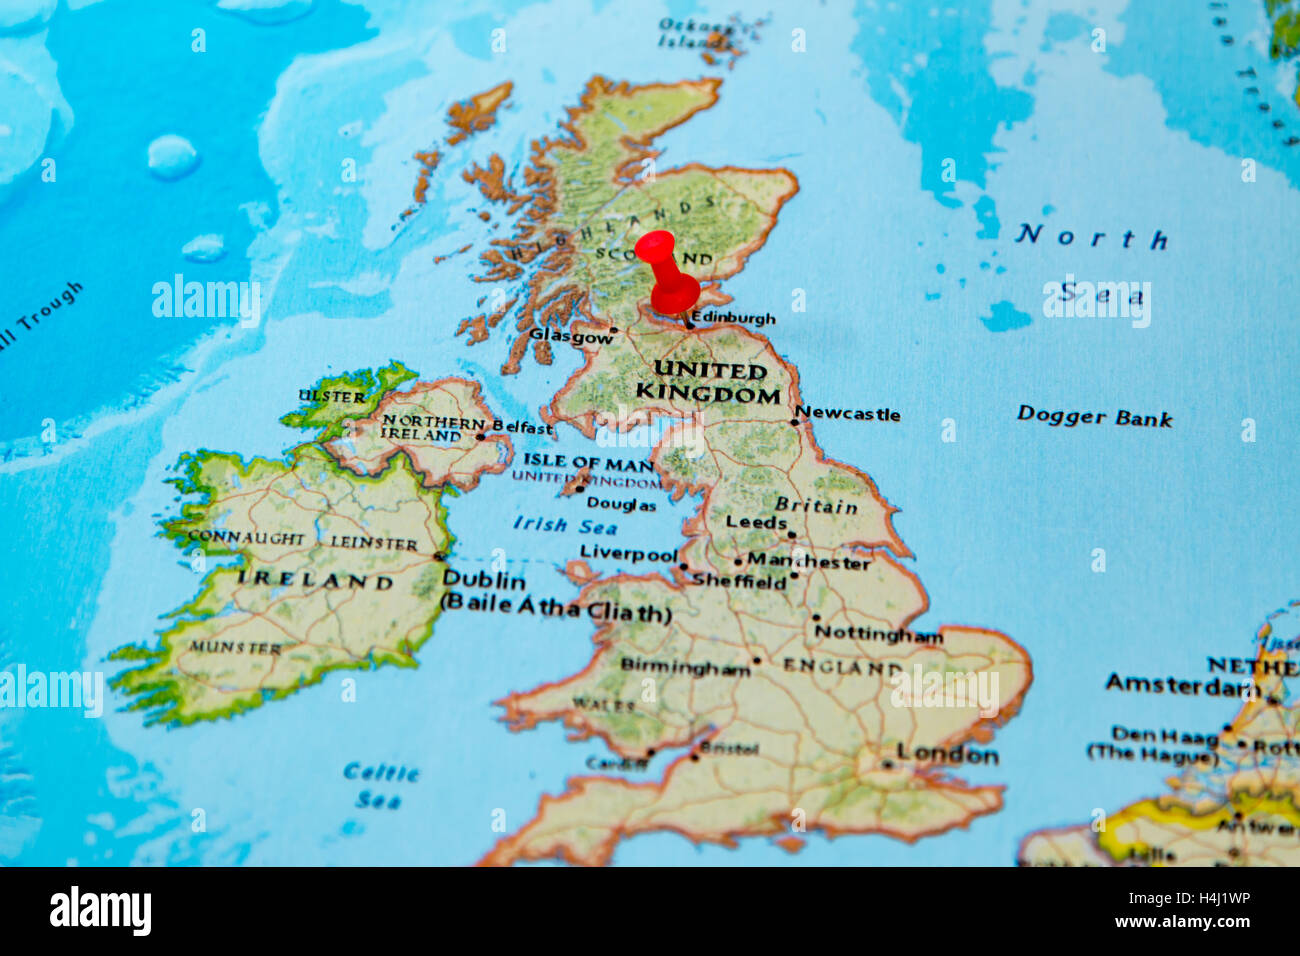 Edimburgo Escocia Anclado En Un Mapa De Europa Foto Imagen De